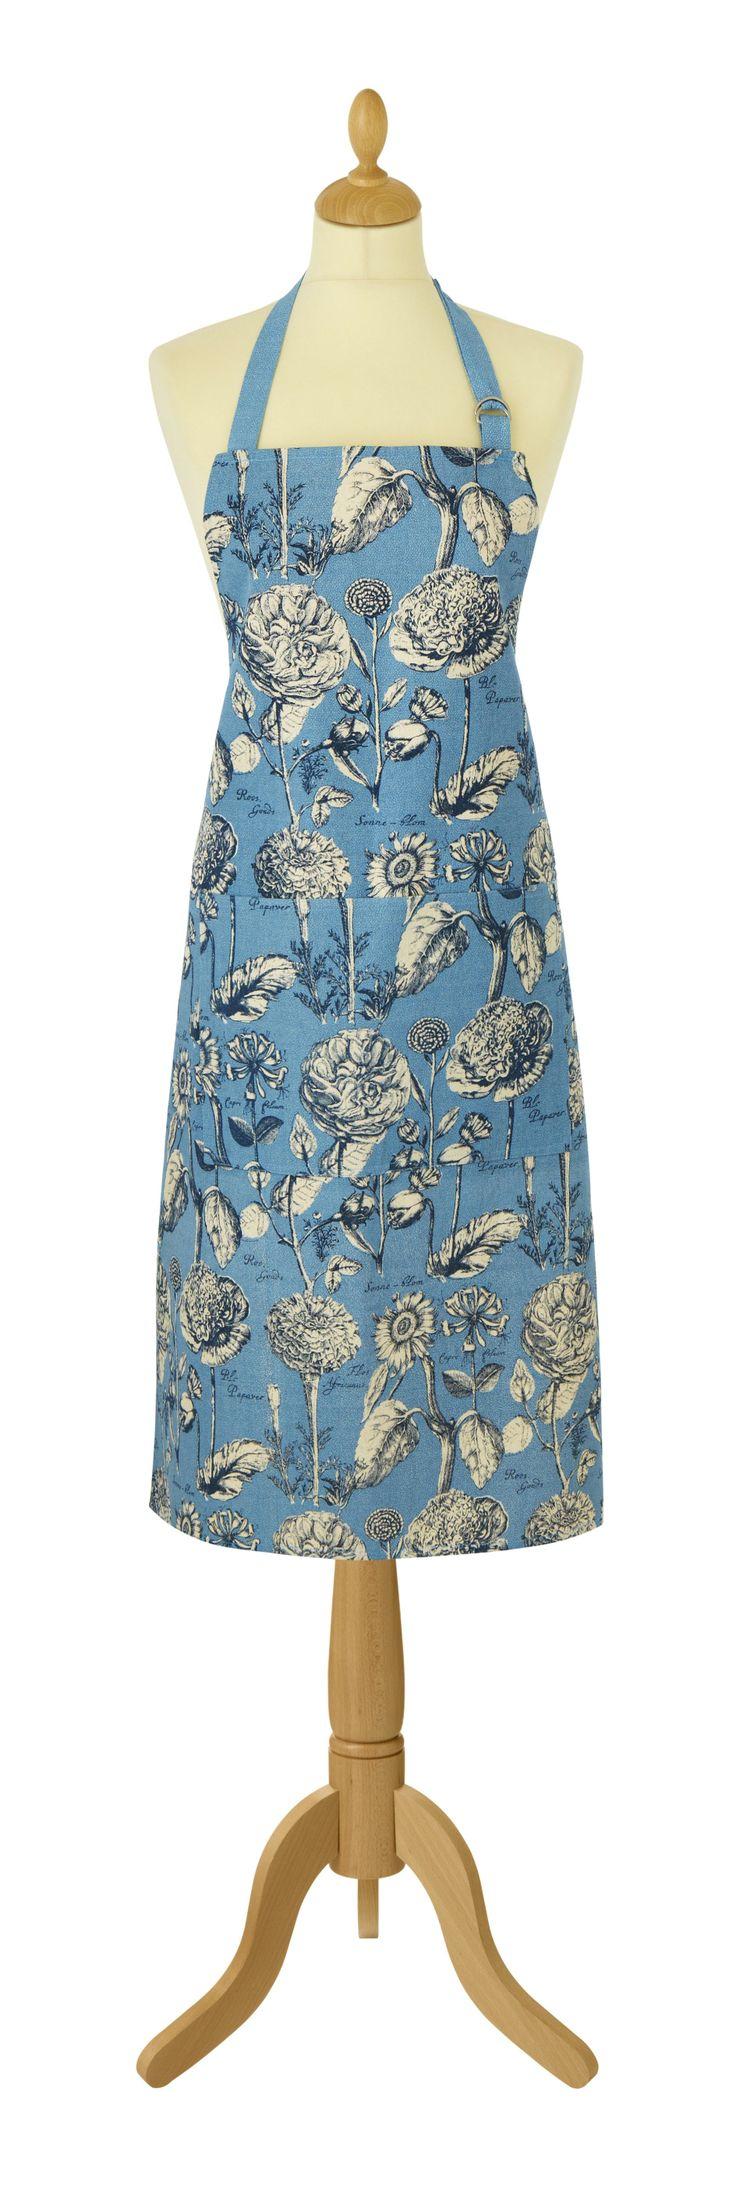 Blue apron engineering - Rhs Rosemoor Blue Apron Floral Blue Rhs